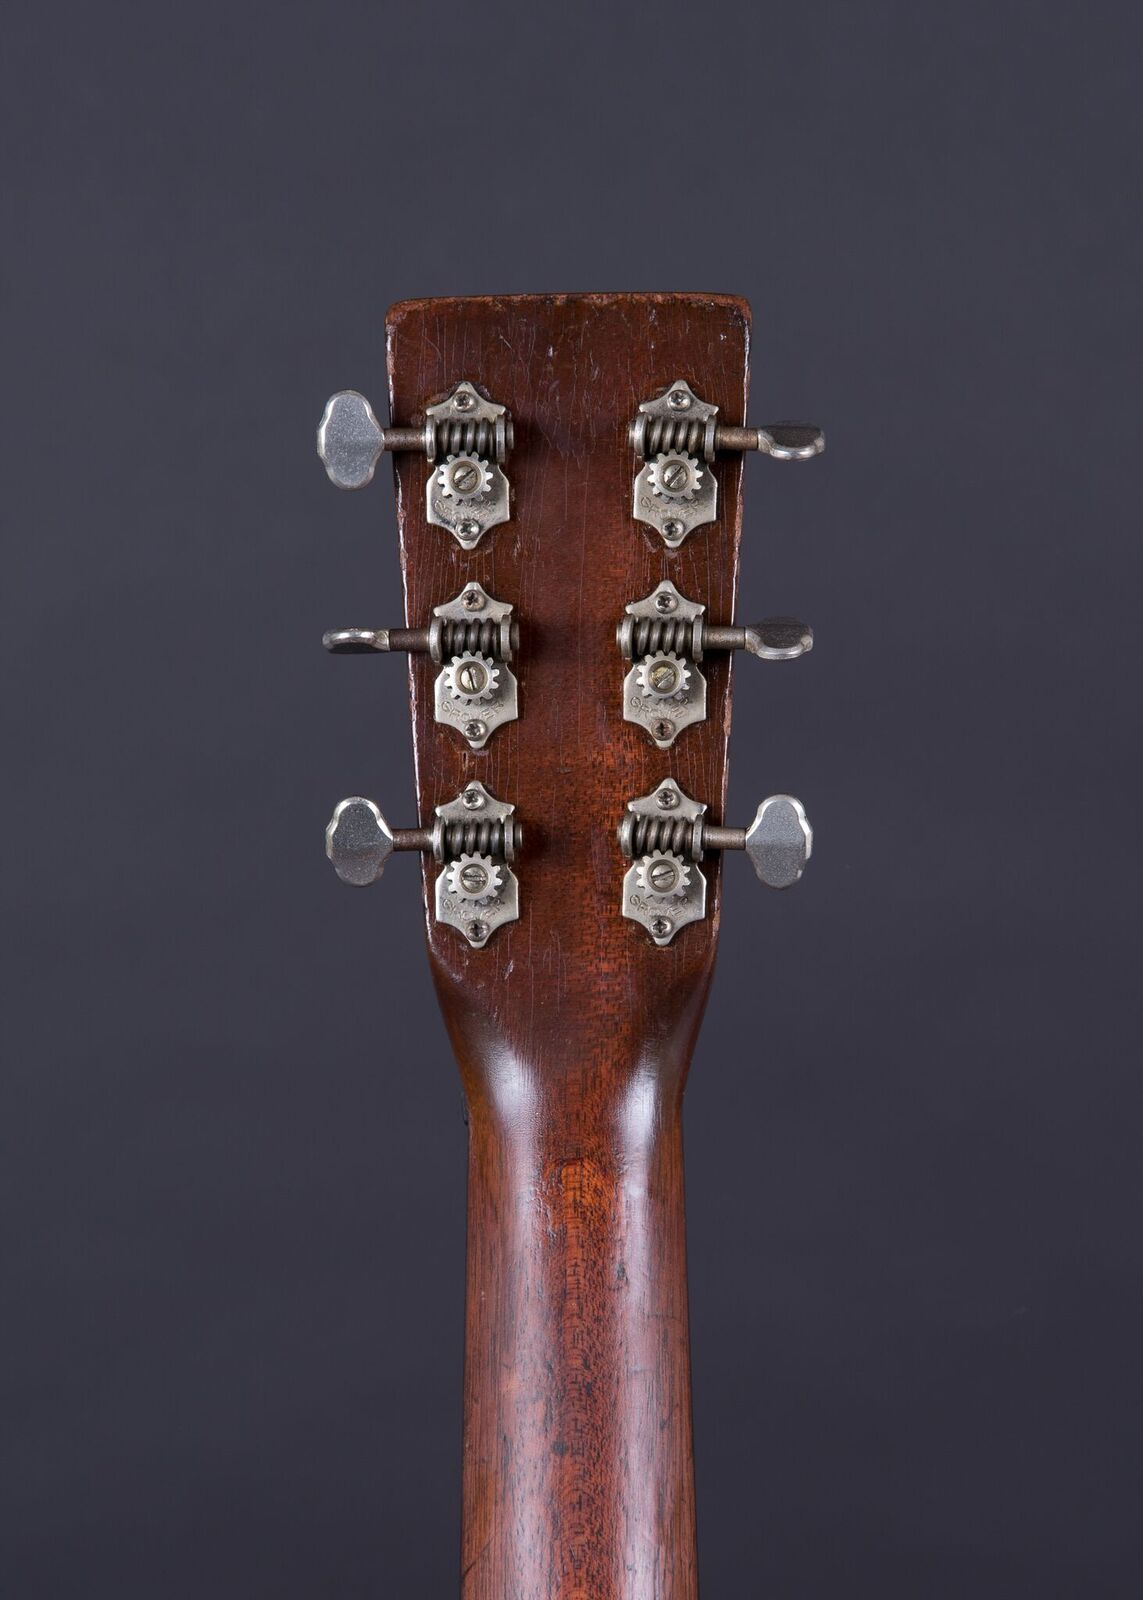 Norman Blake's 1921-000 Martin Guitar